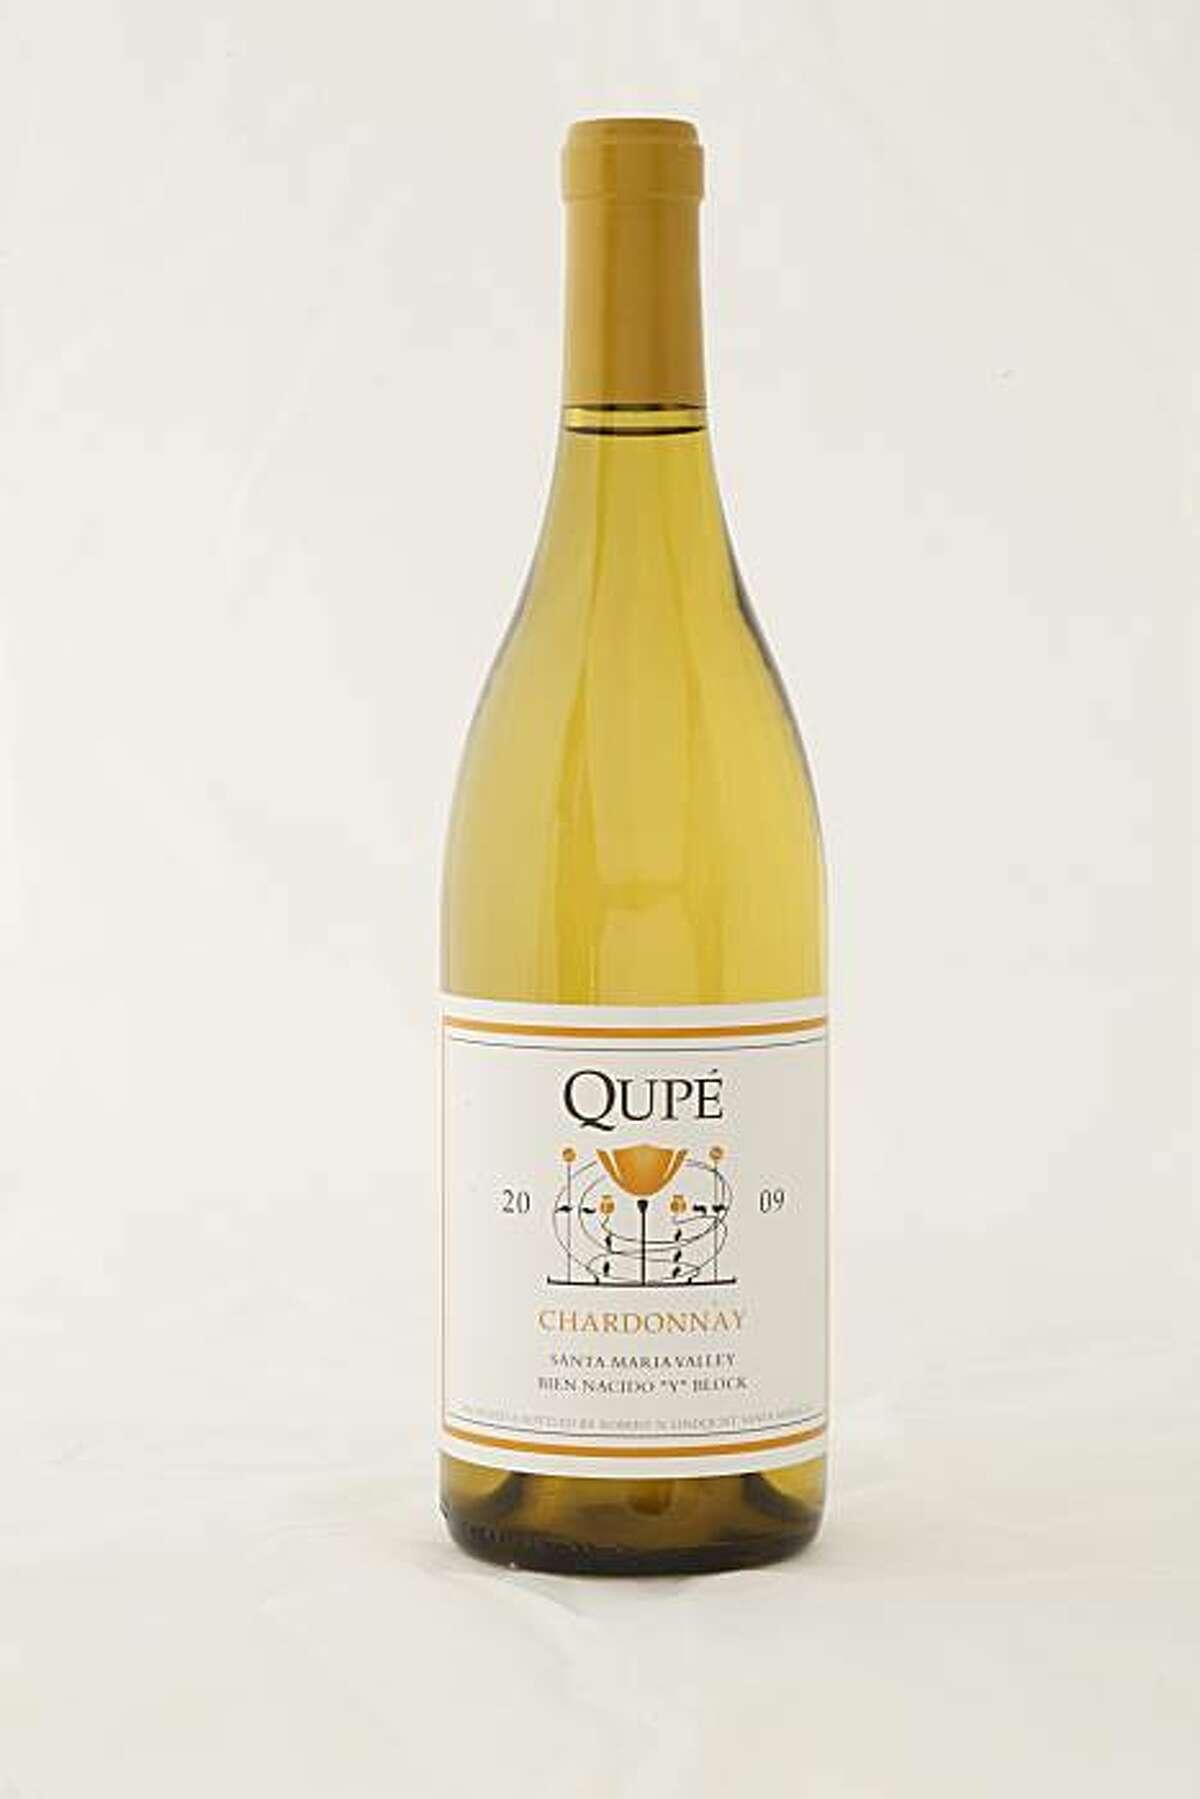 2009 Qupe Chardonnay Santa Maria Valley as seen in San Francisco, California, on January 26, 2010.